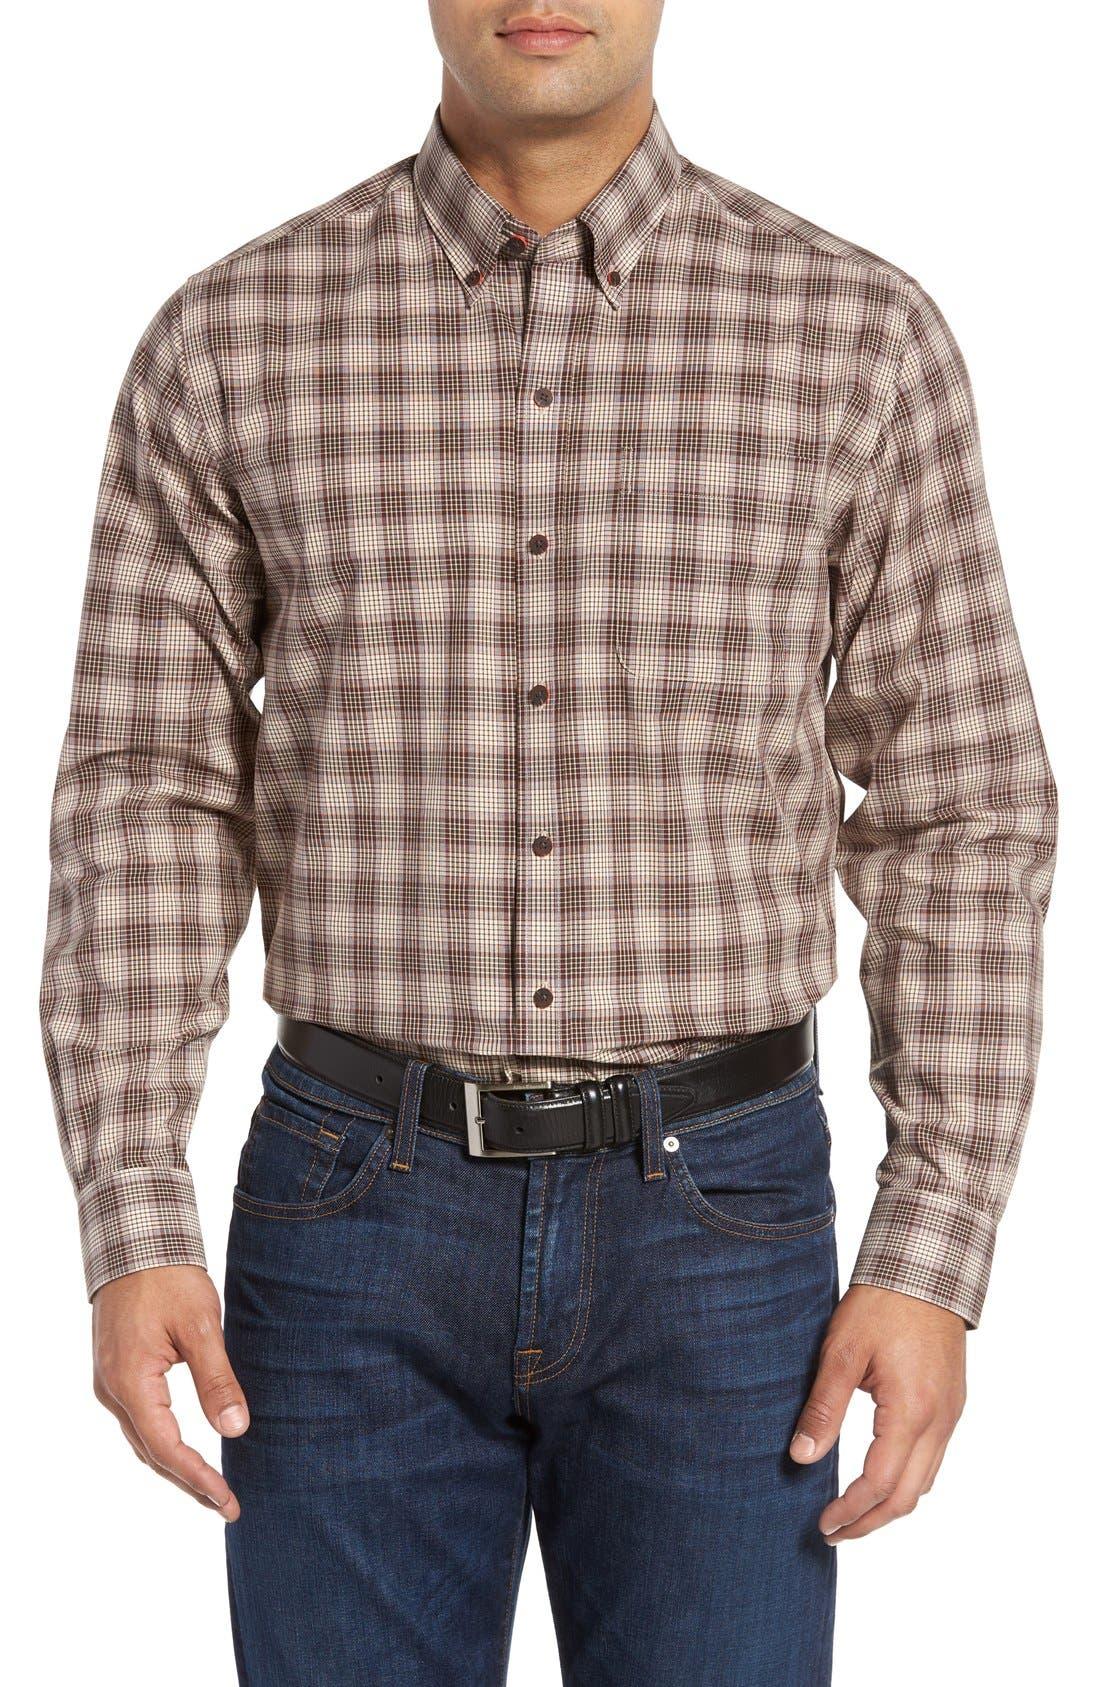 Main Image - Cutter & Buck 'Ridge' Plaid Cotton Poplin Sport Shirt (Big & Tall)